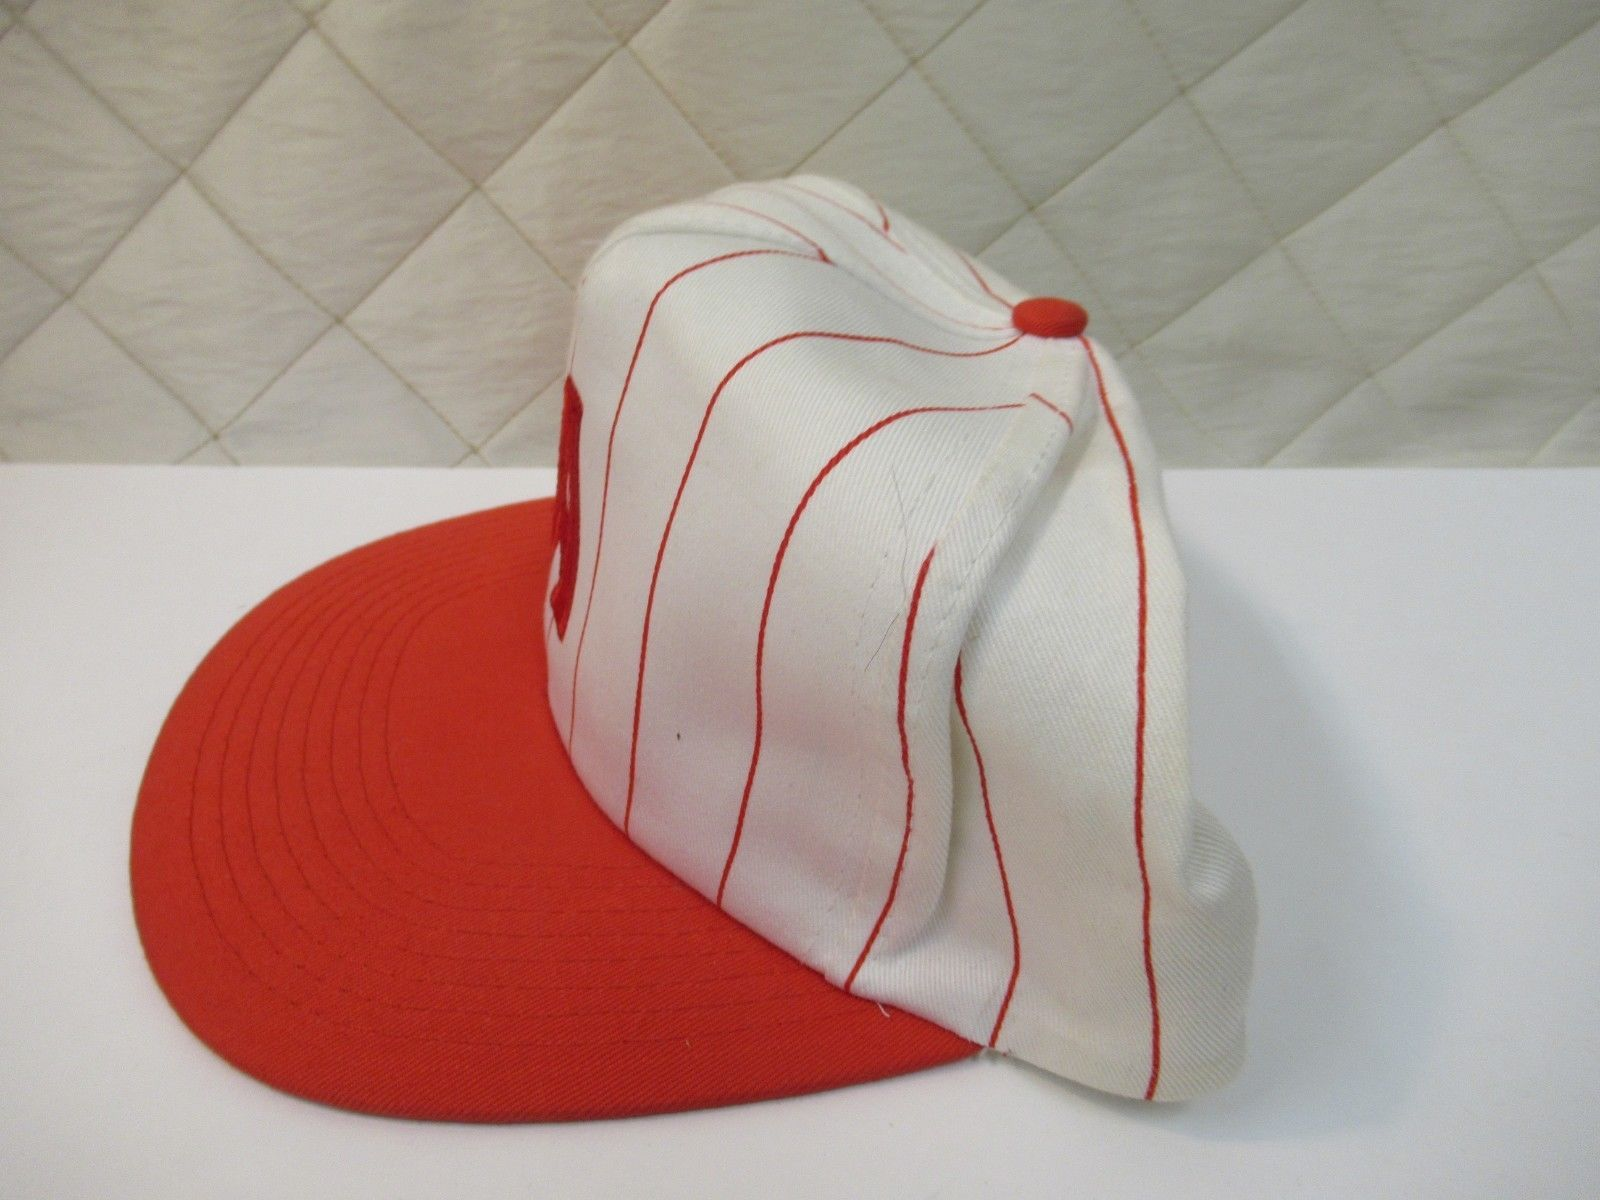 Vancouver Asahi Hat Baseball Cap Japanese and 50 similar items f20c176ddd87